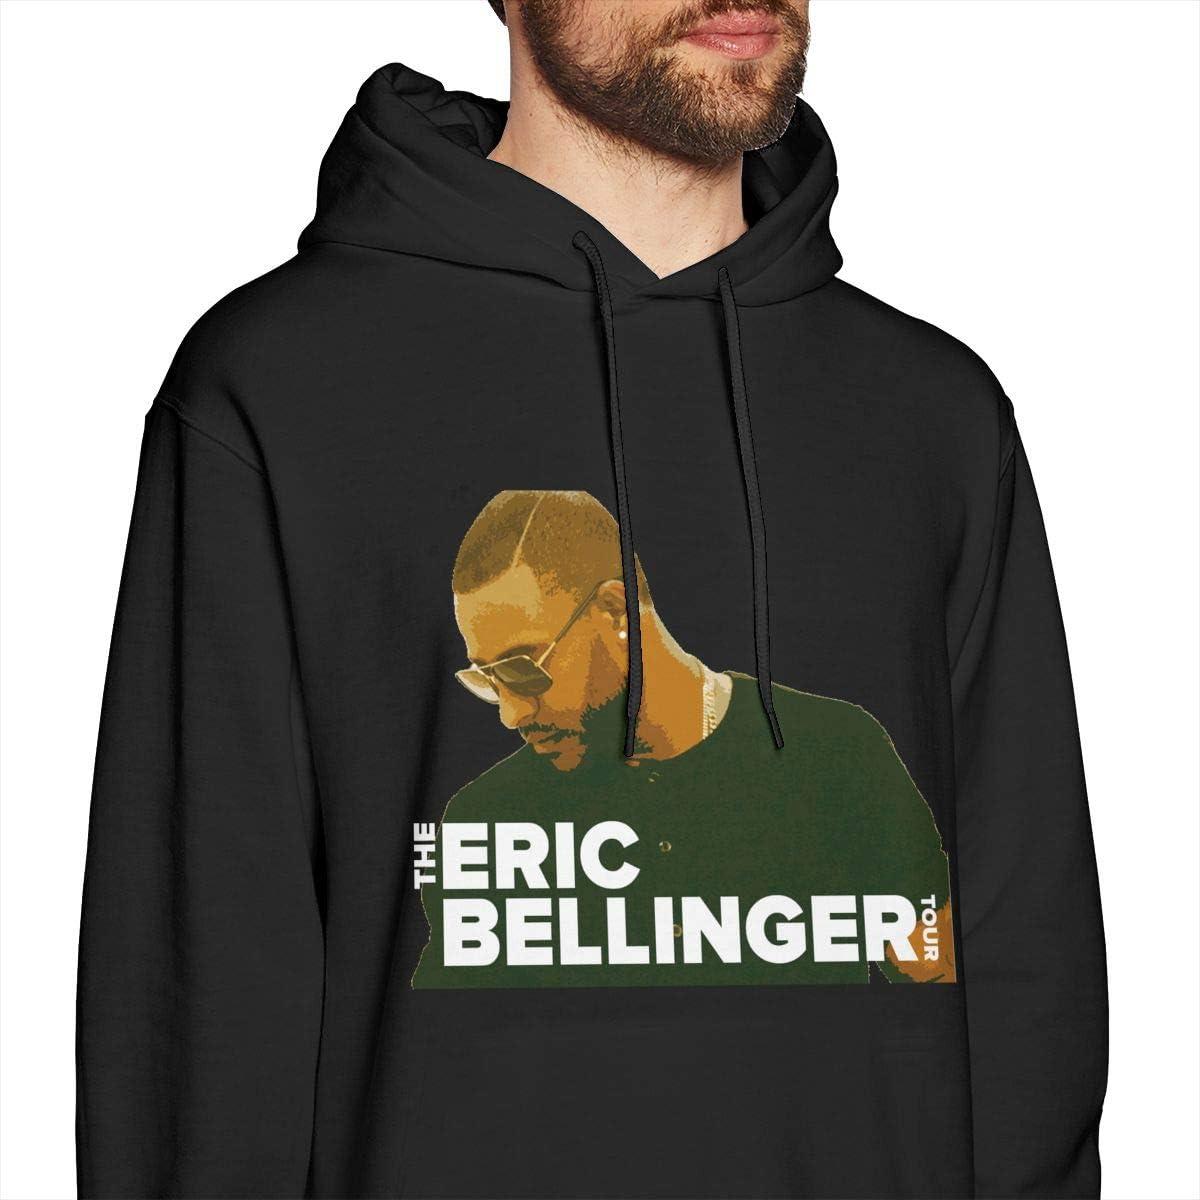 Dxfbdfxn Eric Bellinger Fashion Mens Long Sleeve Hoodie Top Black